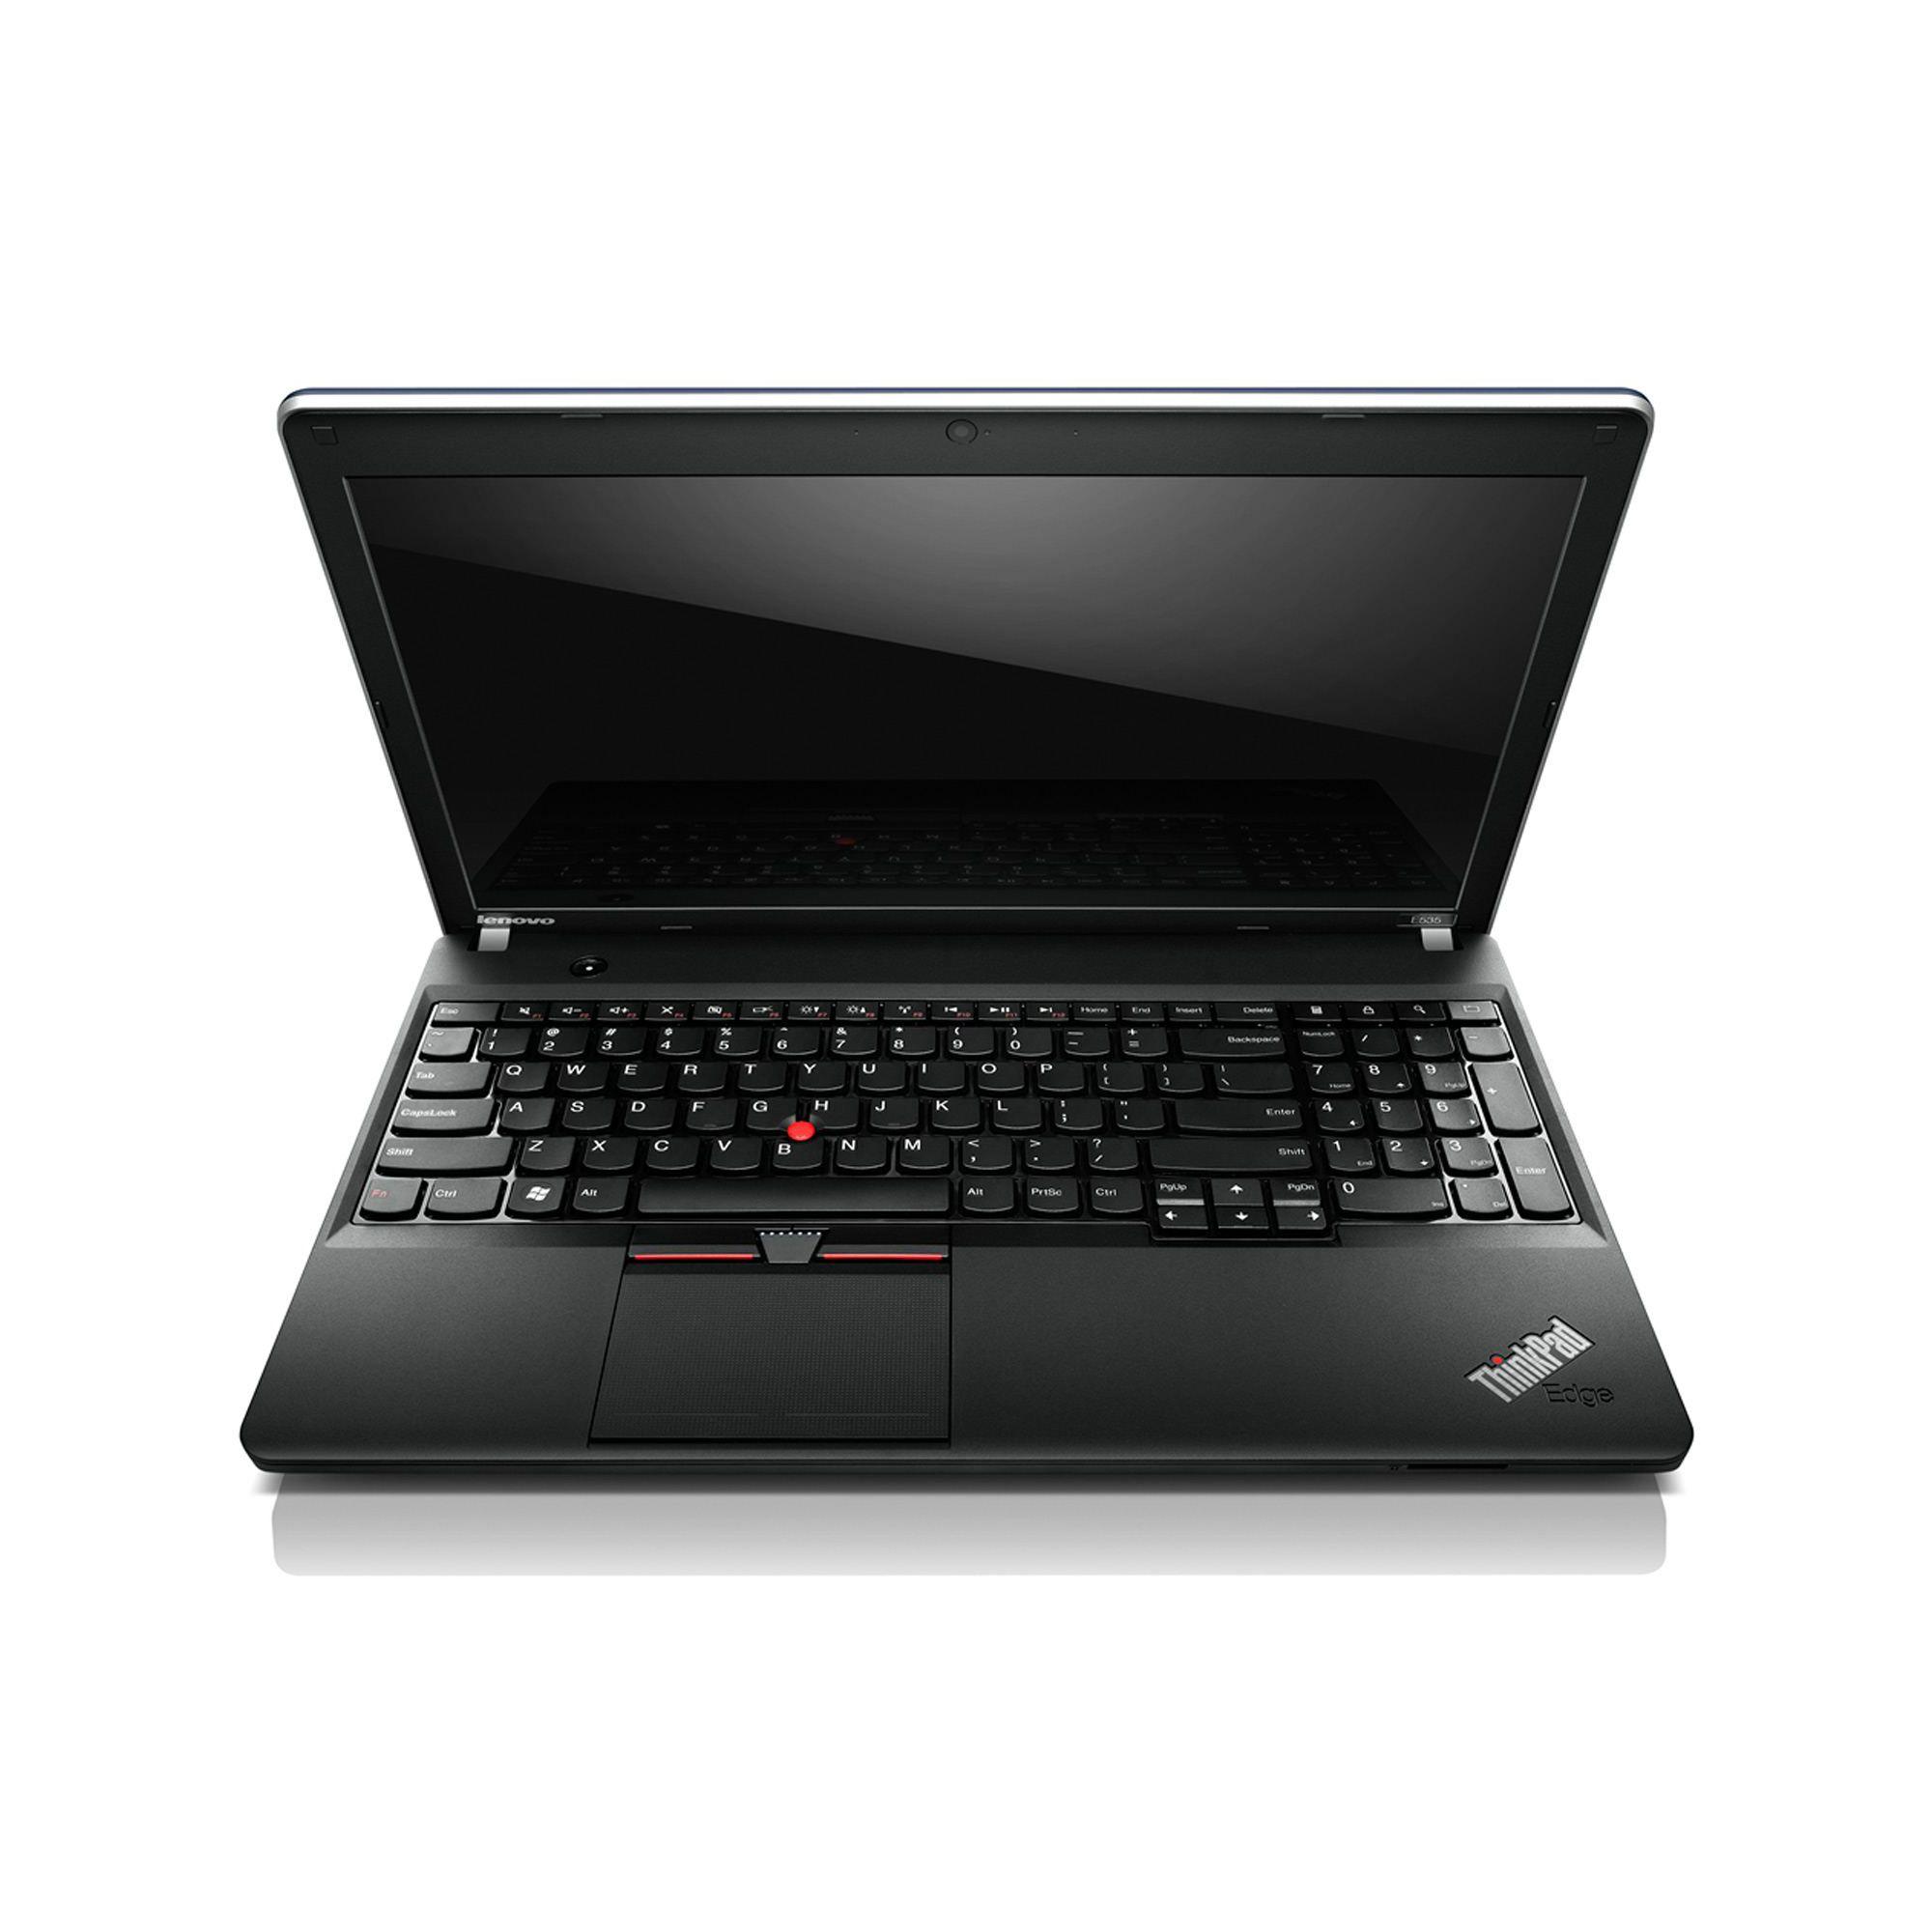 Lenovo ThinkPad Edge E535 3260ECG (15.6 inch) Notebook AMD A6 (4400M) 2.7GHz 4GB 500GB DVD±RW WLAN BT Webcam Windows 7 Pro 64-bit/Windows 8 Pro at Tescos Direct